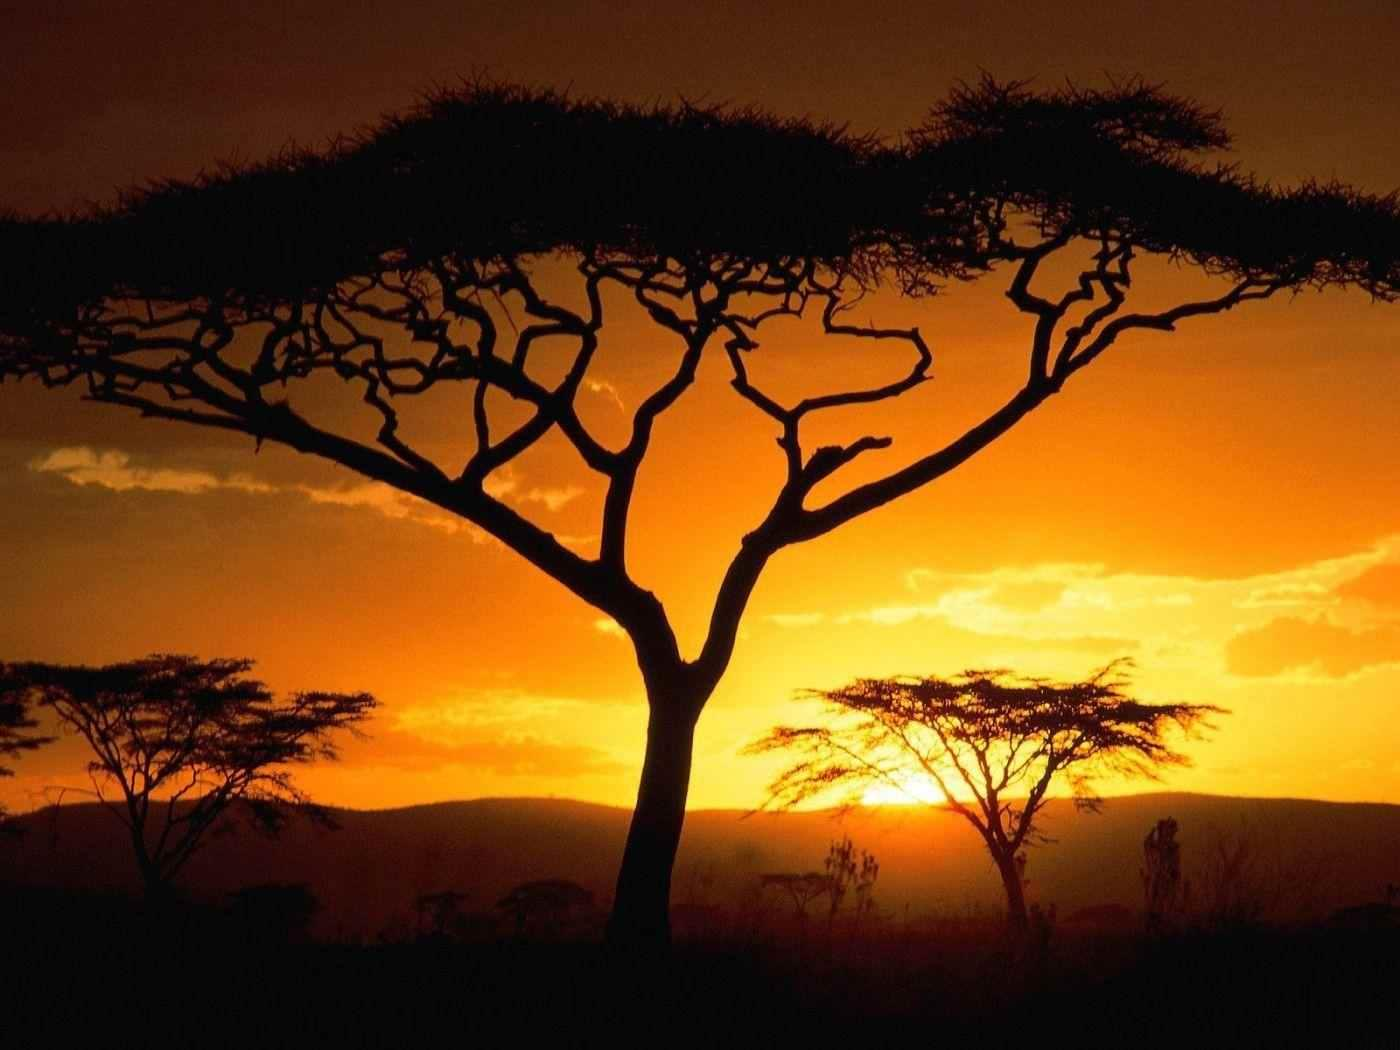 Africa Wallpapers 4s3 14 1 - تصاویر طبیعت آفریقا   Africa Wallpapers